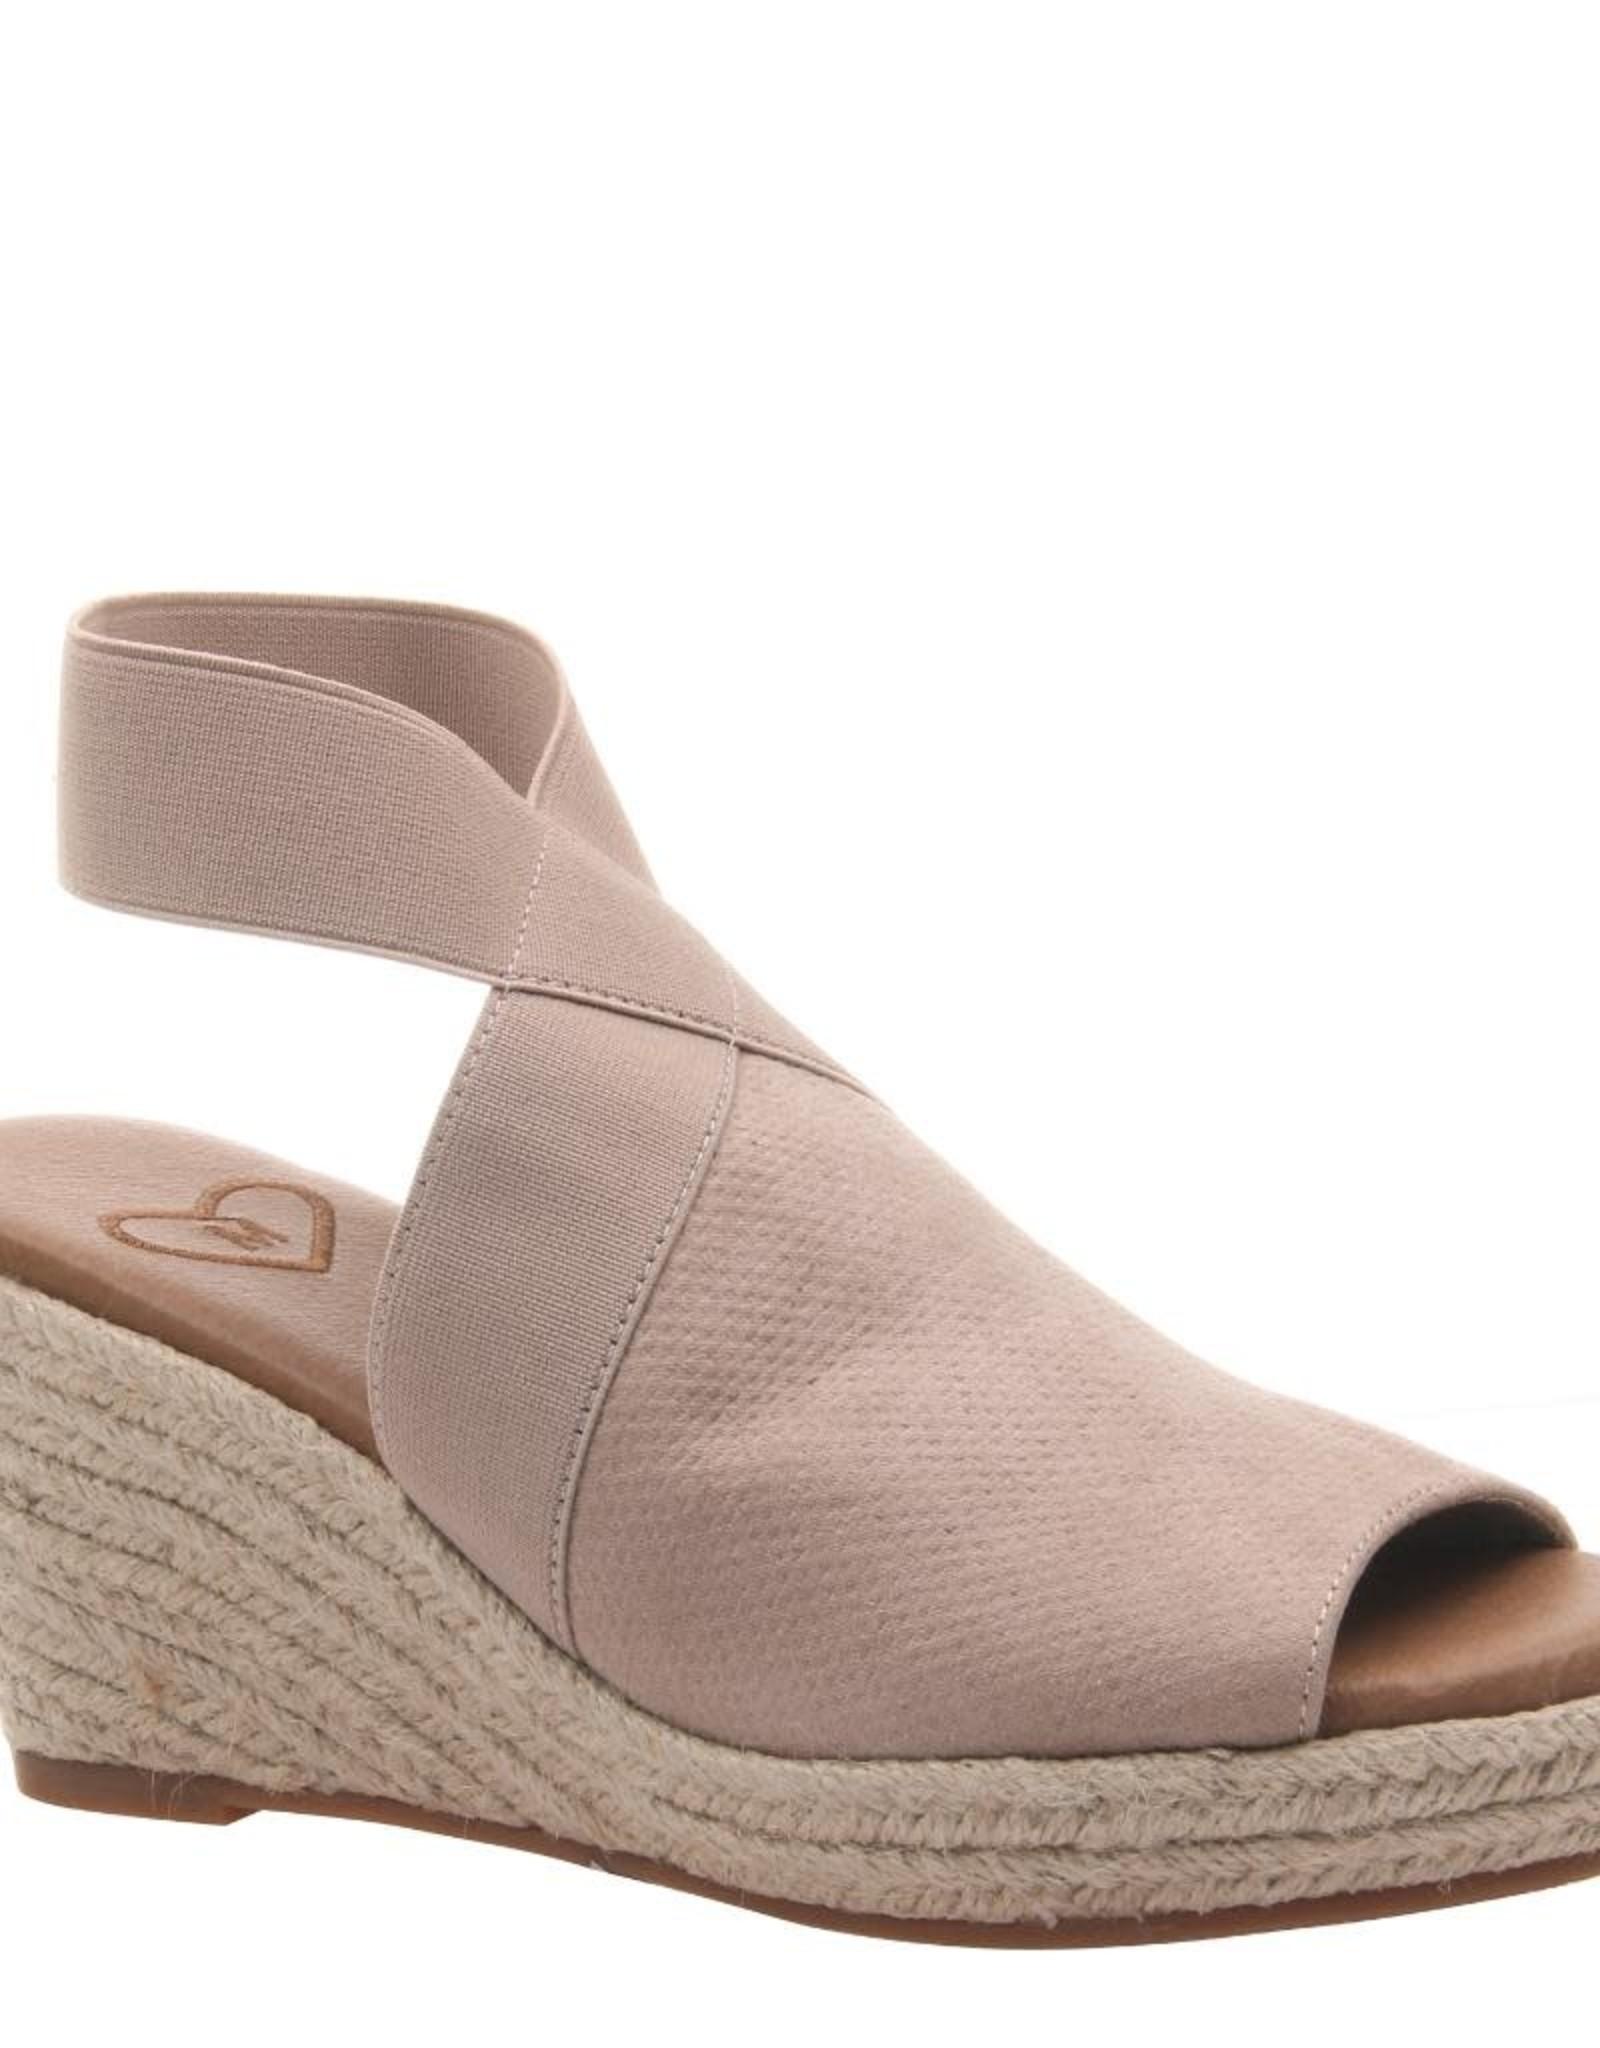 CS-Sunny Day Sandal